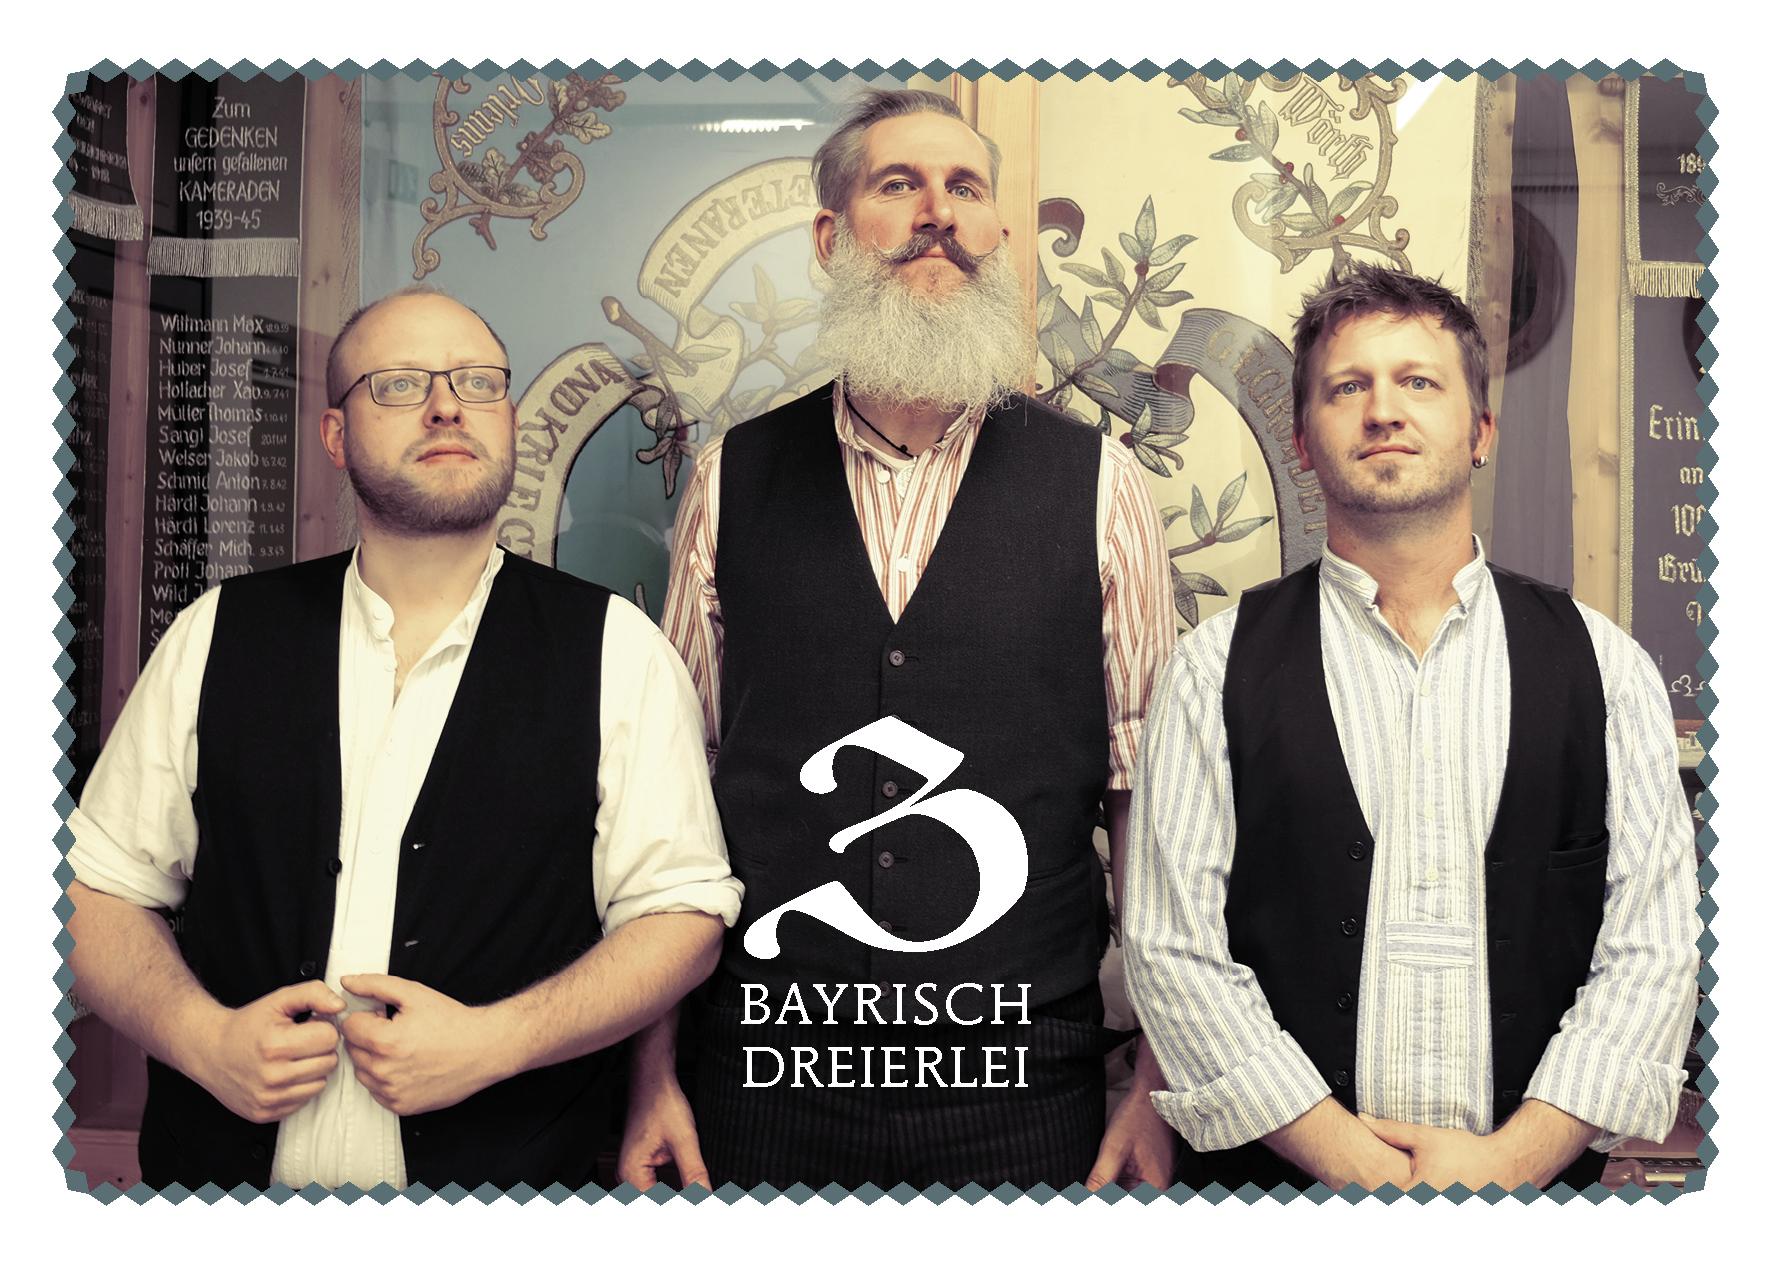 Bayrisch Dreierlei